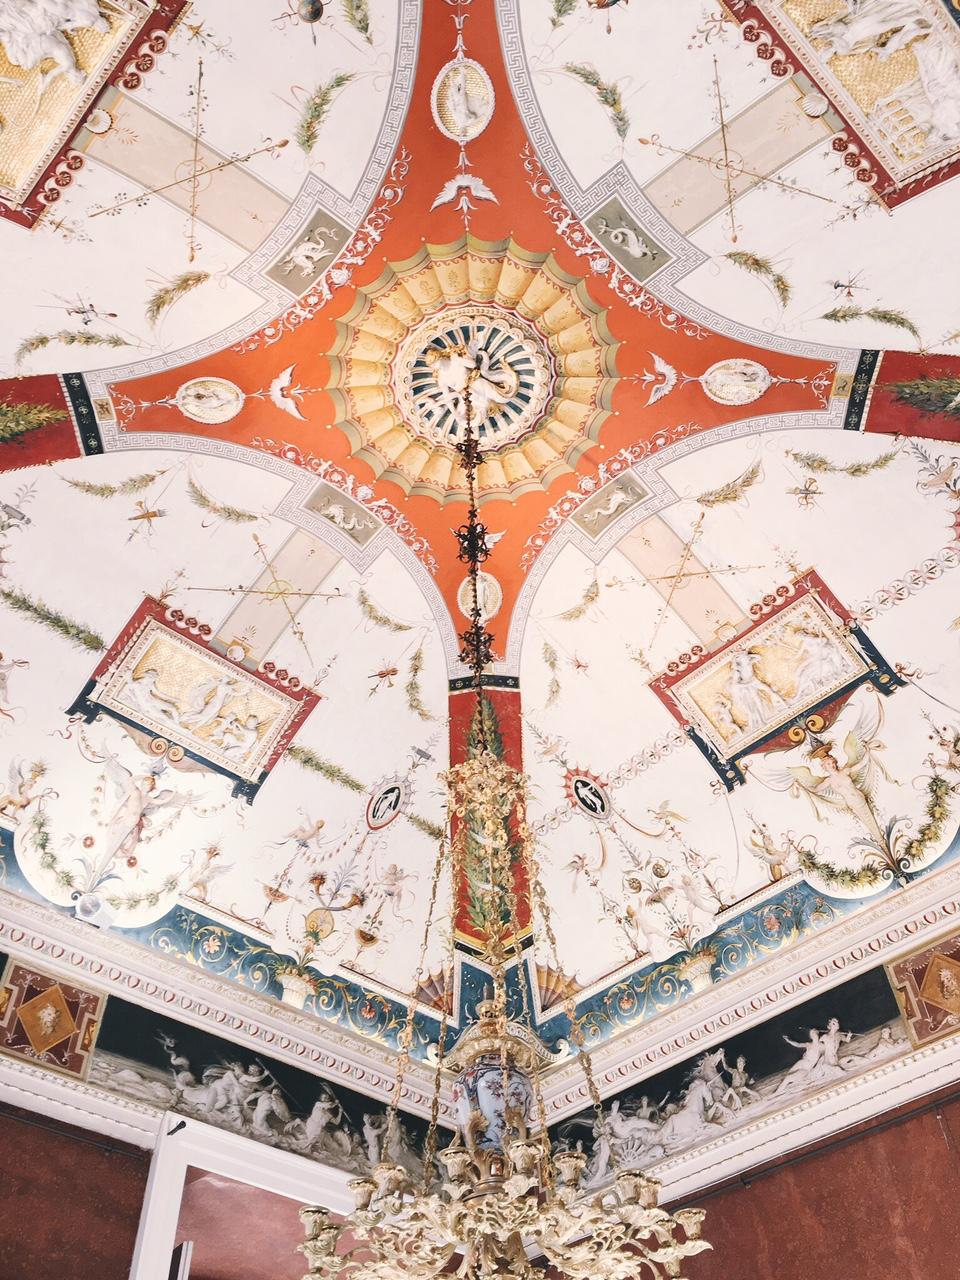 Villa Carlotta in Lake Como, Italy painted frescoe ceilings